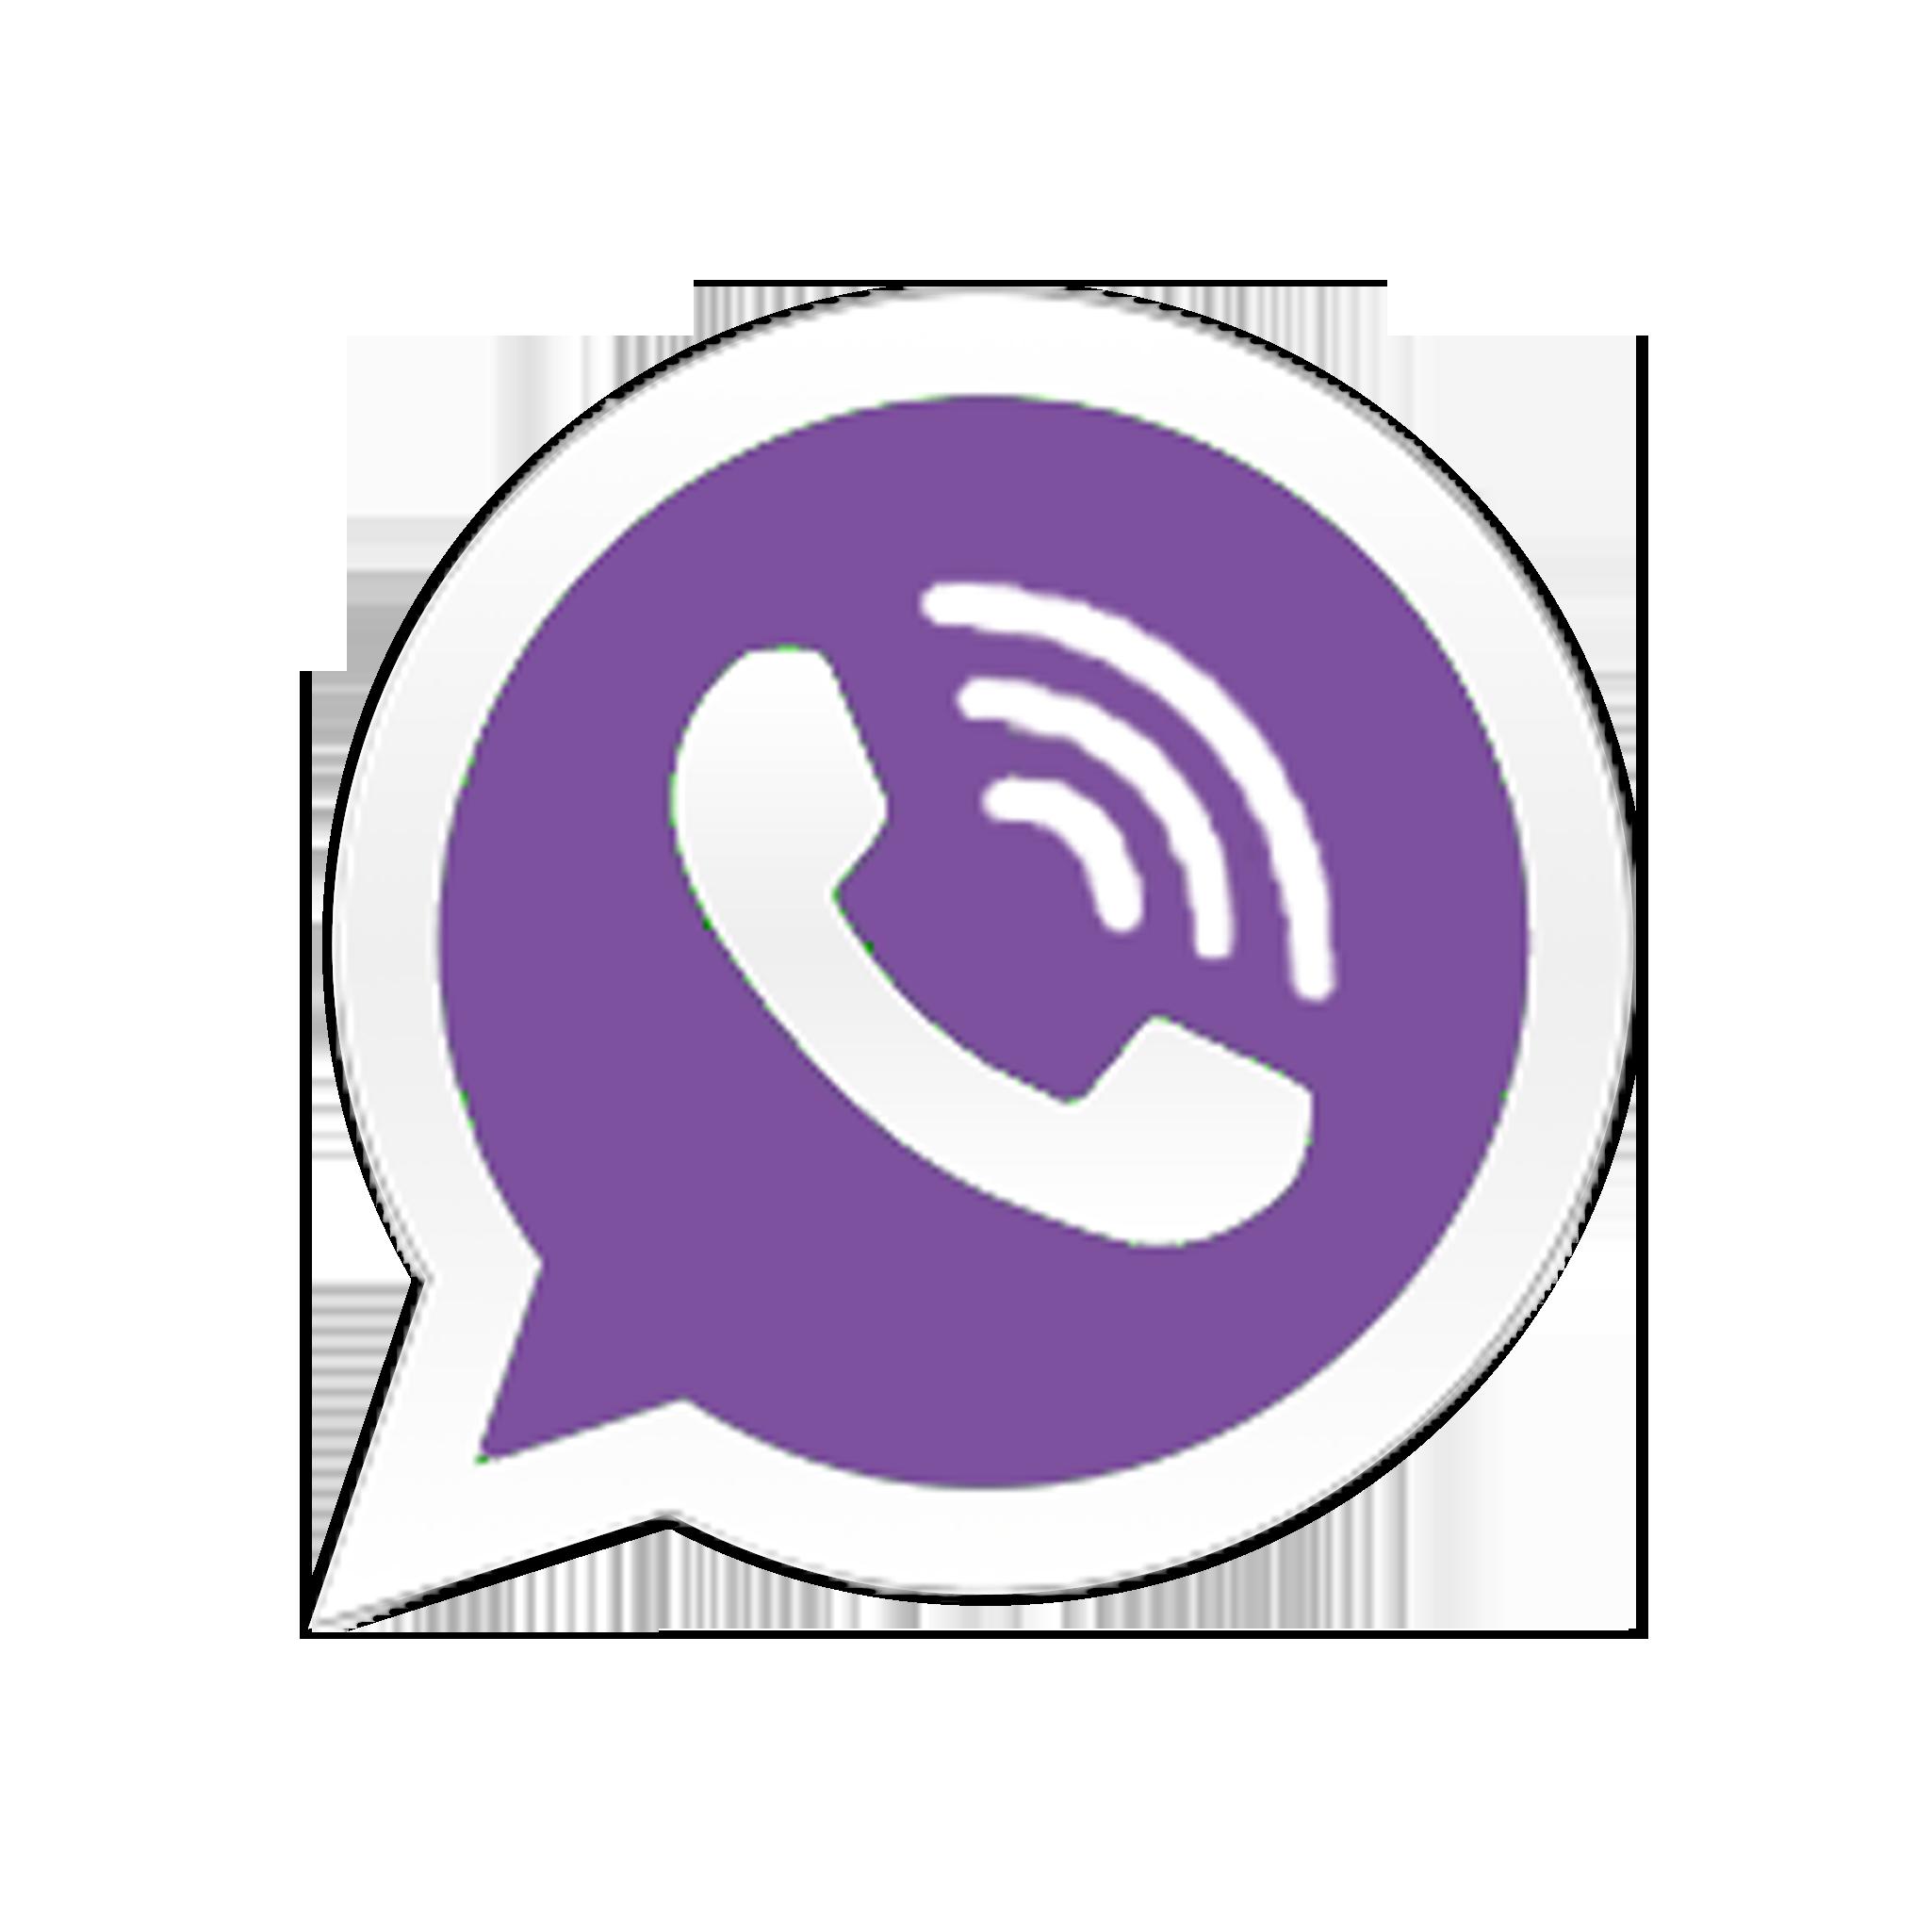 Viber logos PNG images free download Viber Icon Png